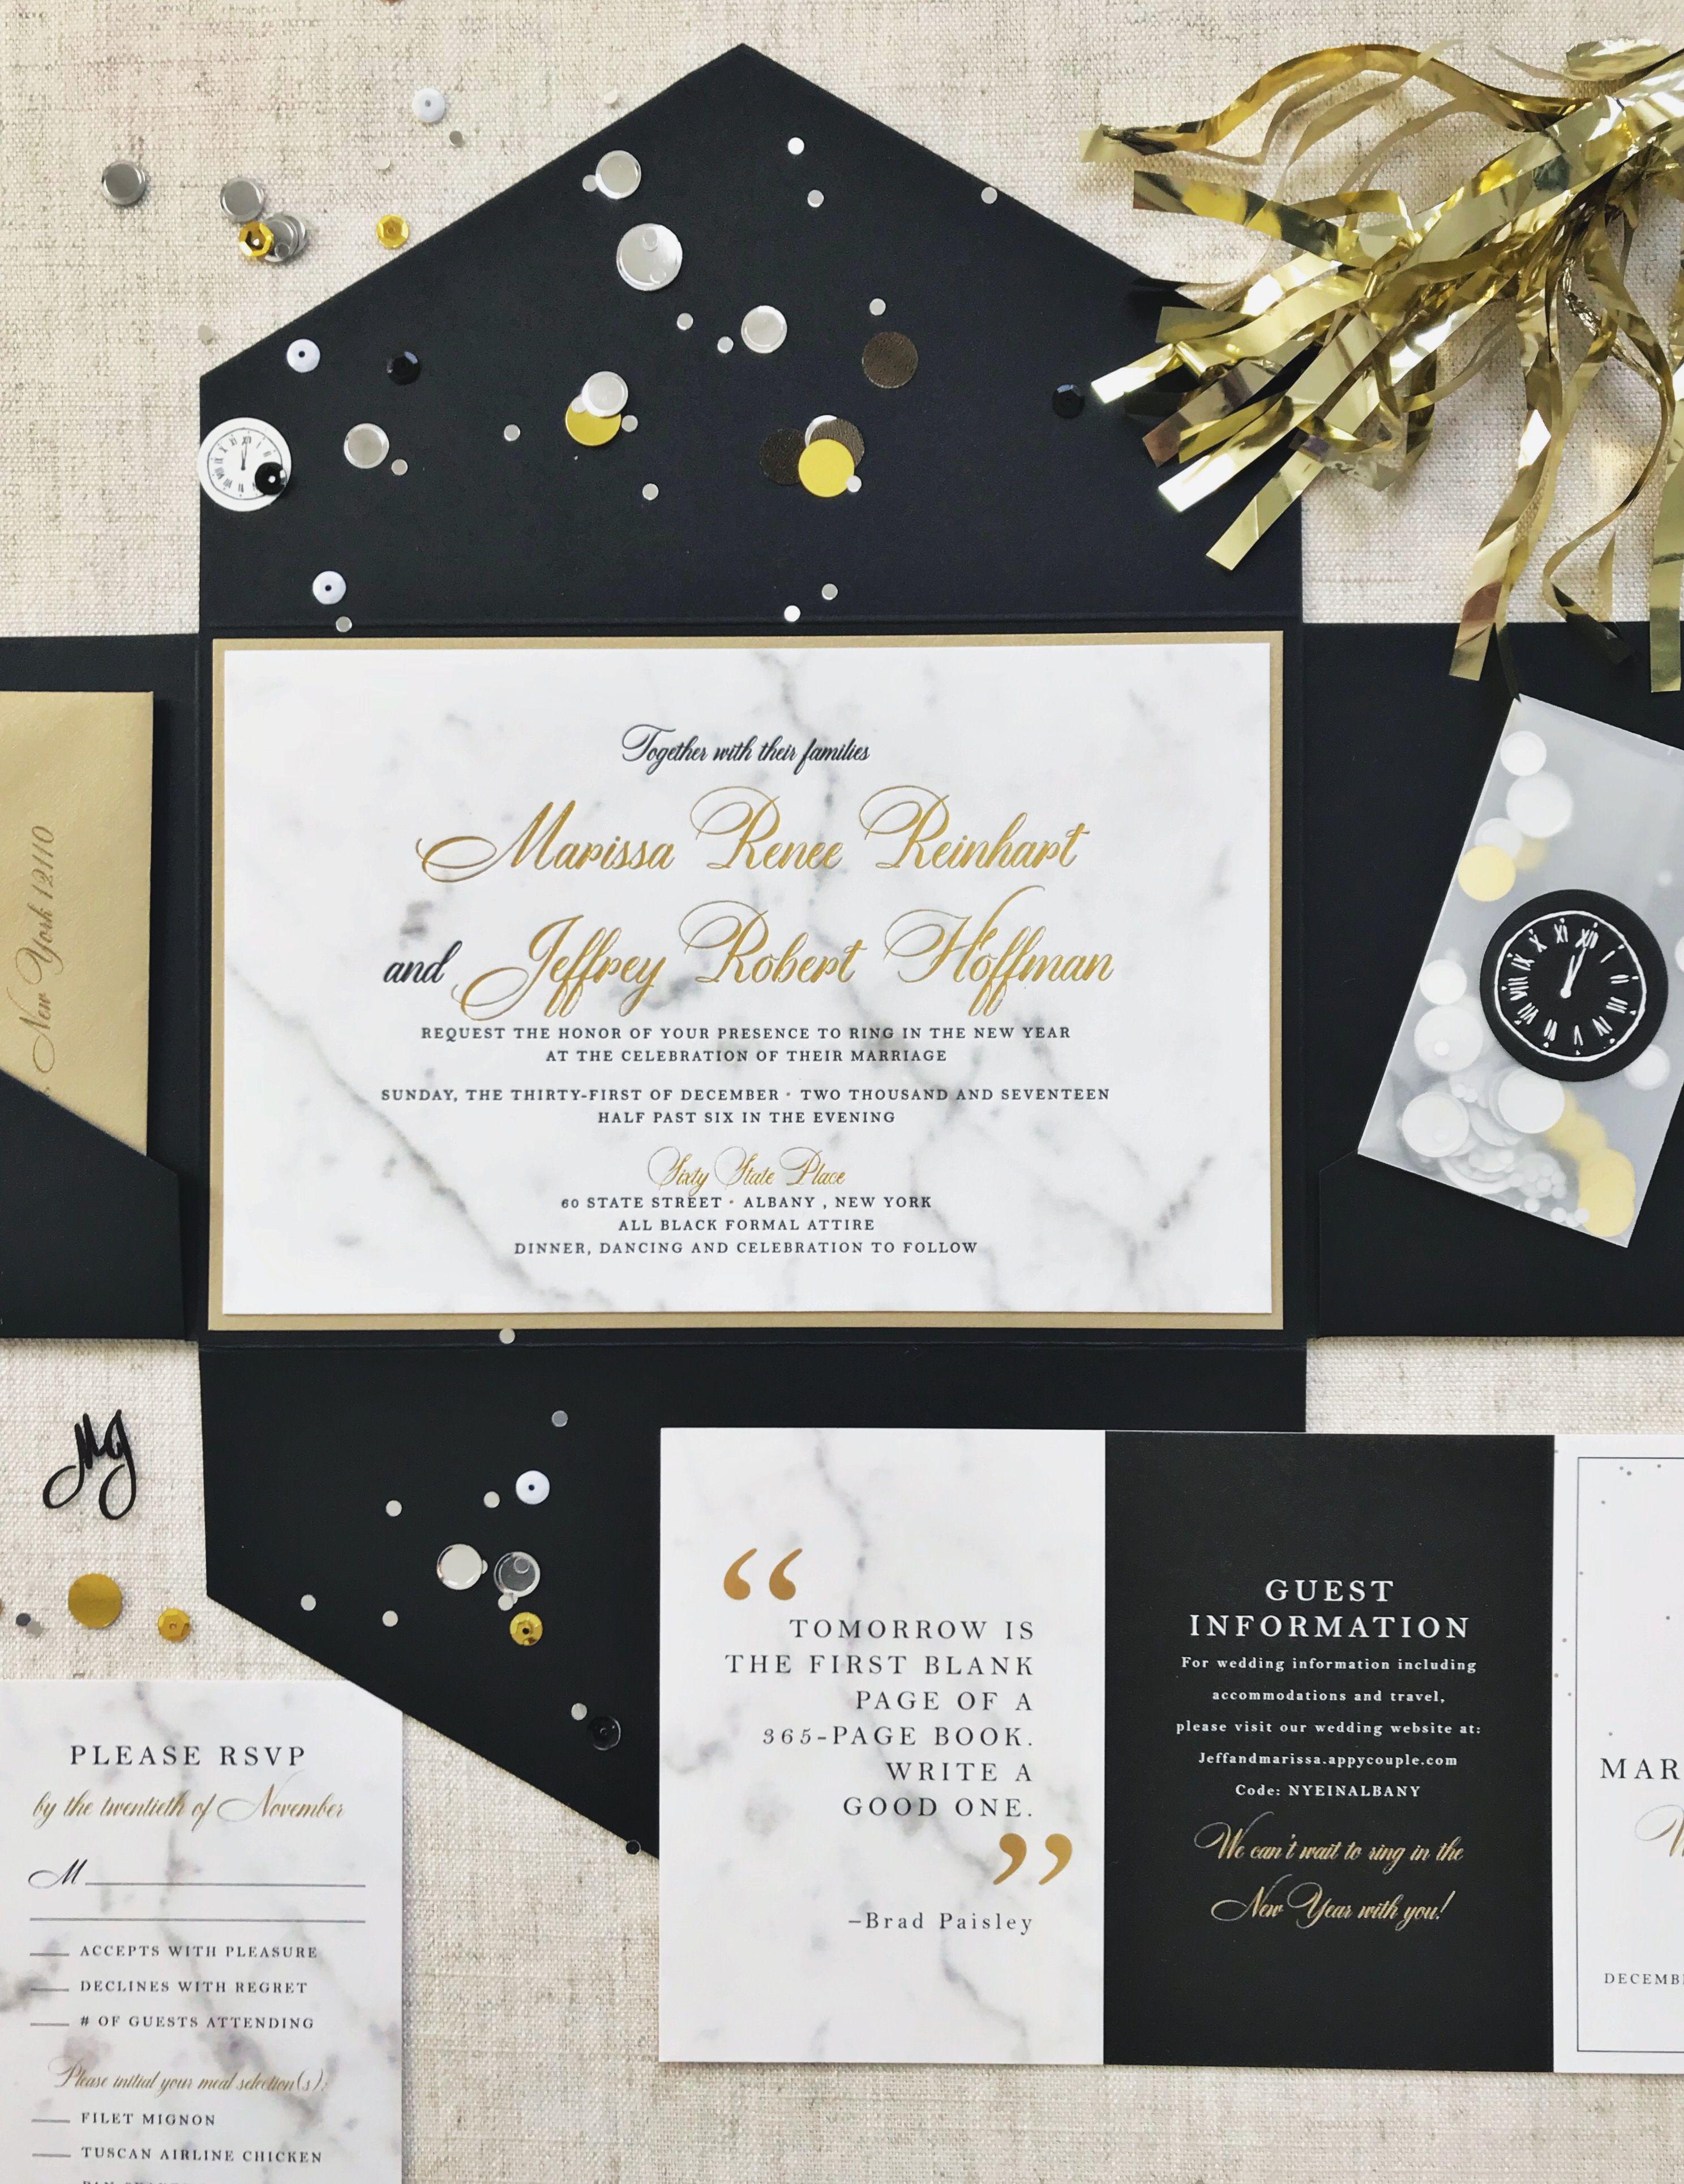 New Years Eve Wedding Invitation, New Years Eve Wedding, Marble ...